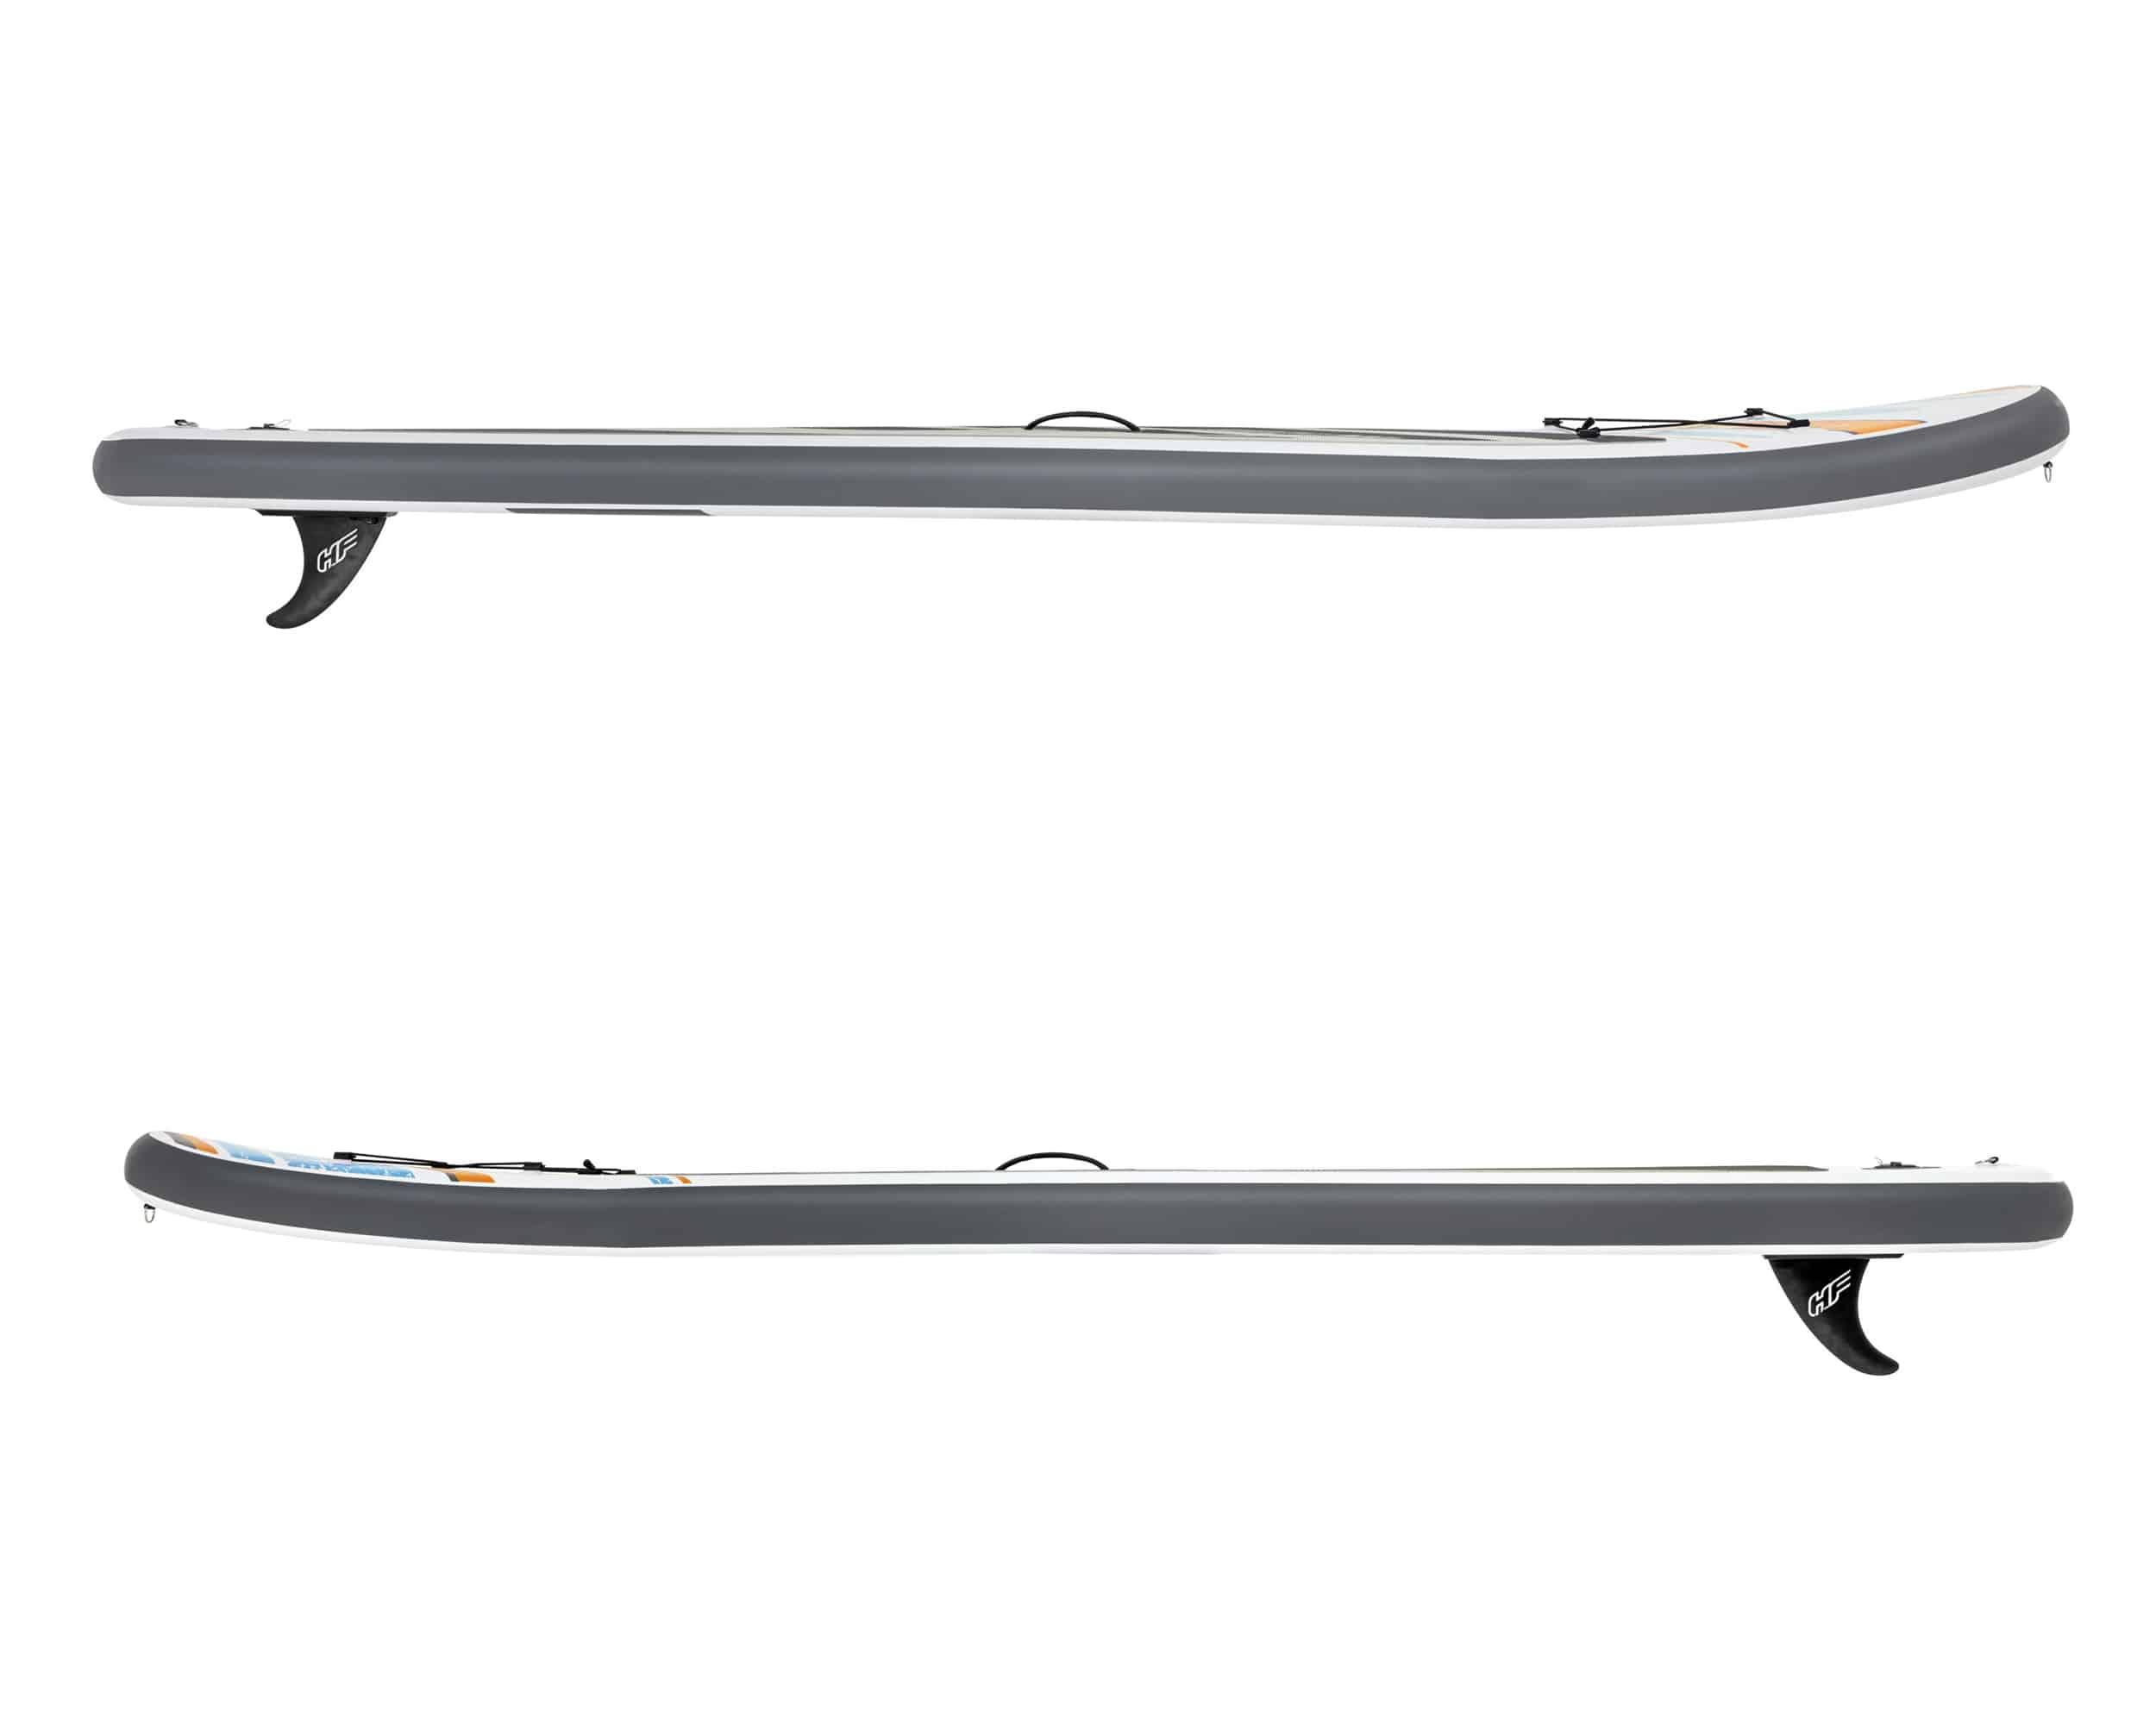 Paddle Board Hydro-Force White Cap Sup Brett